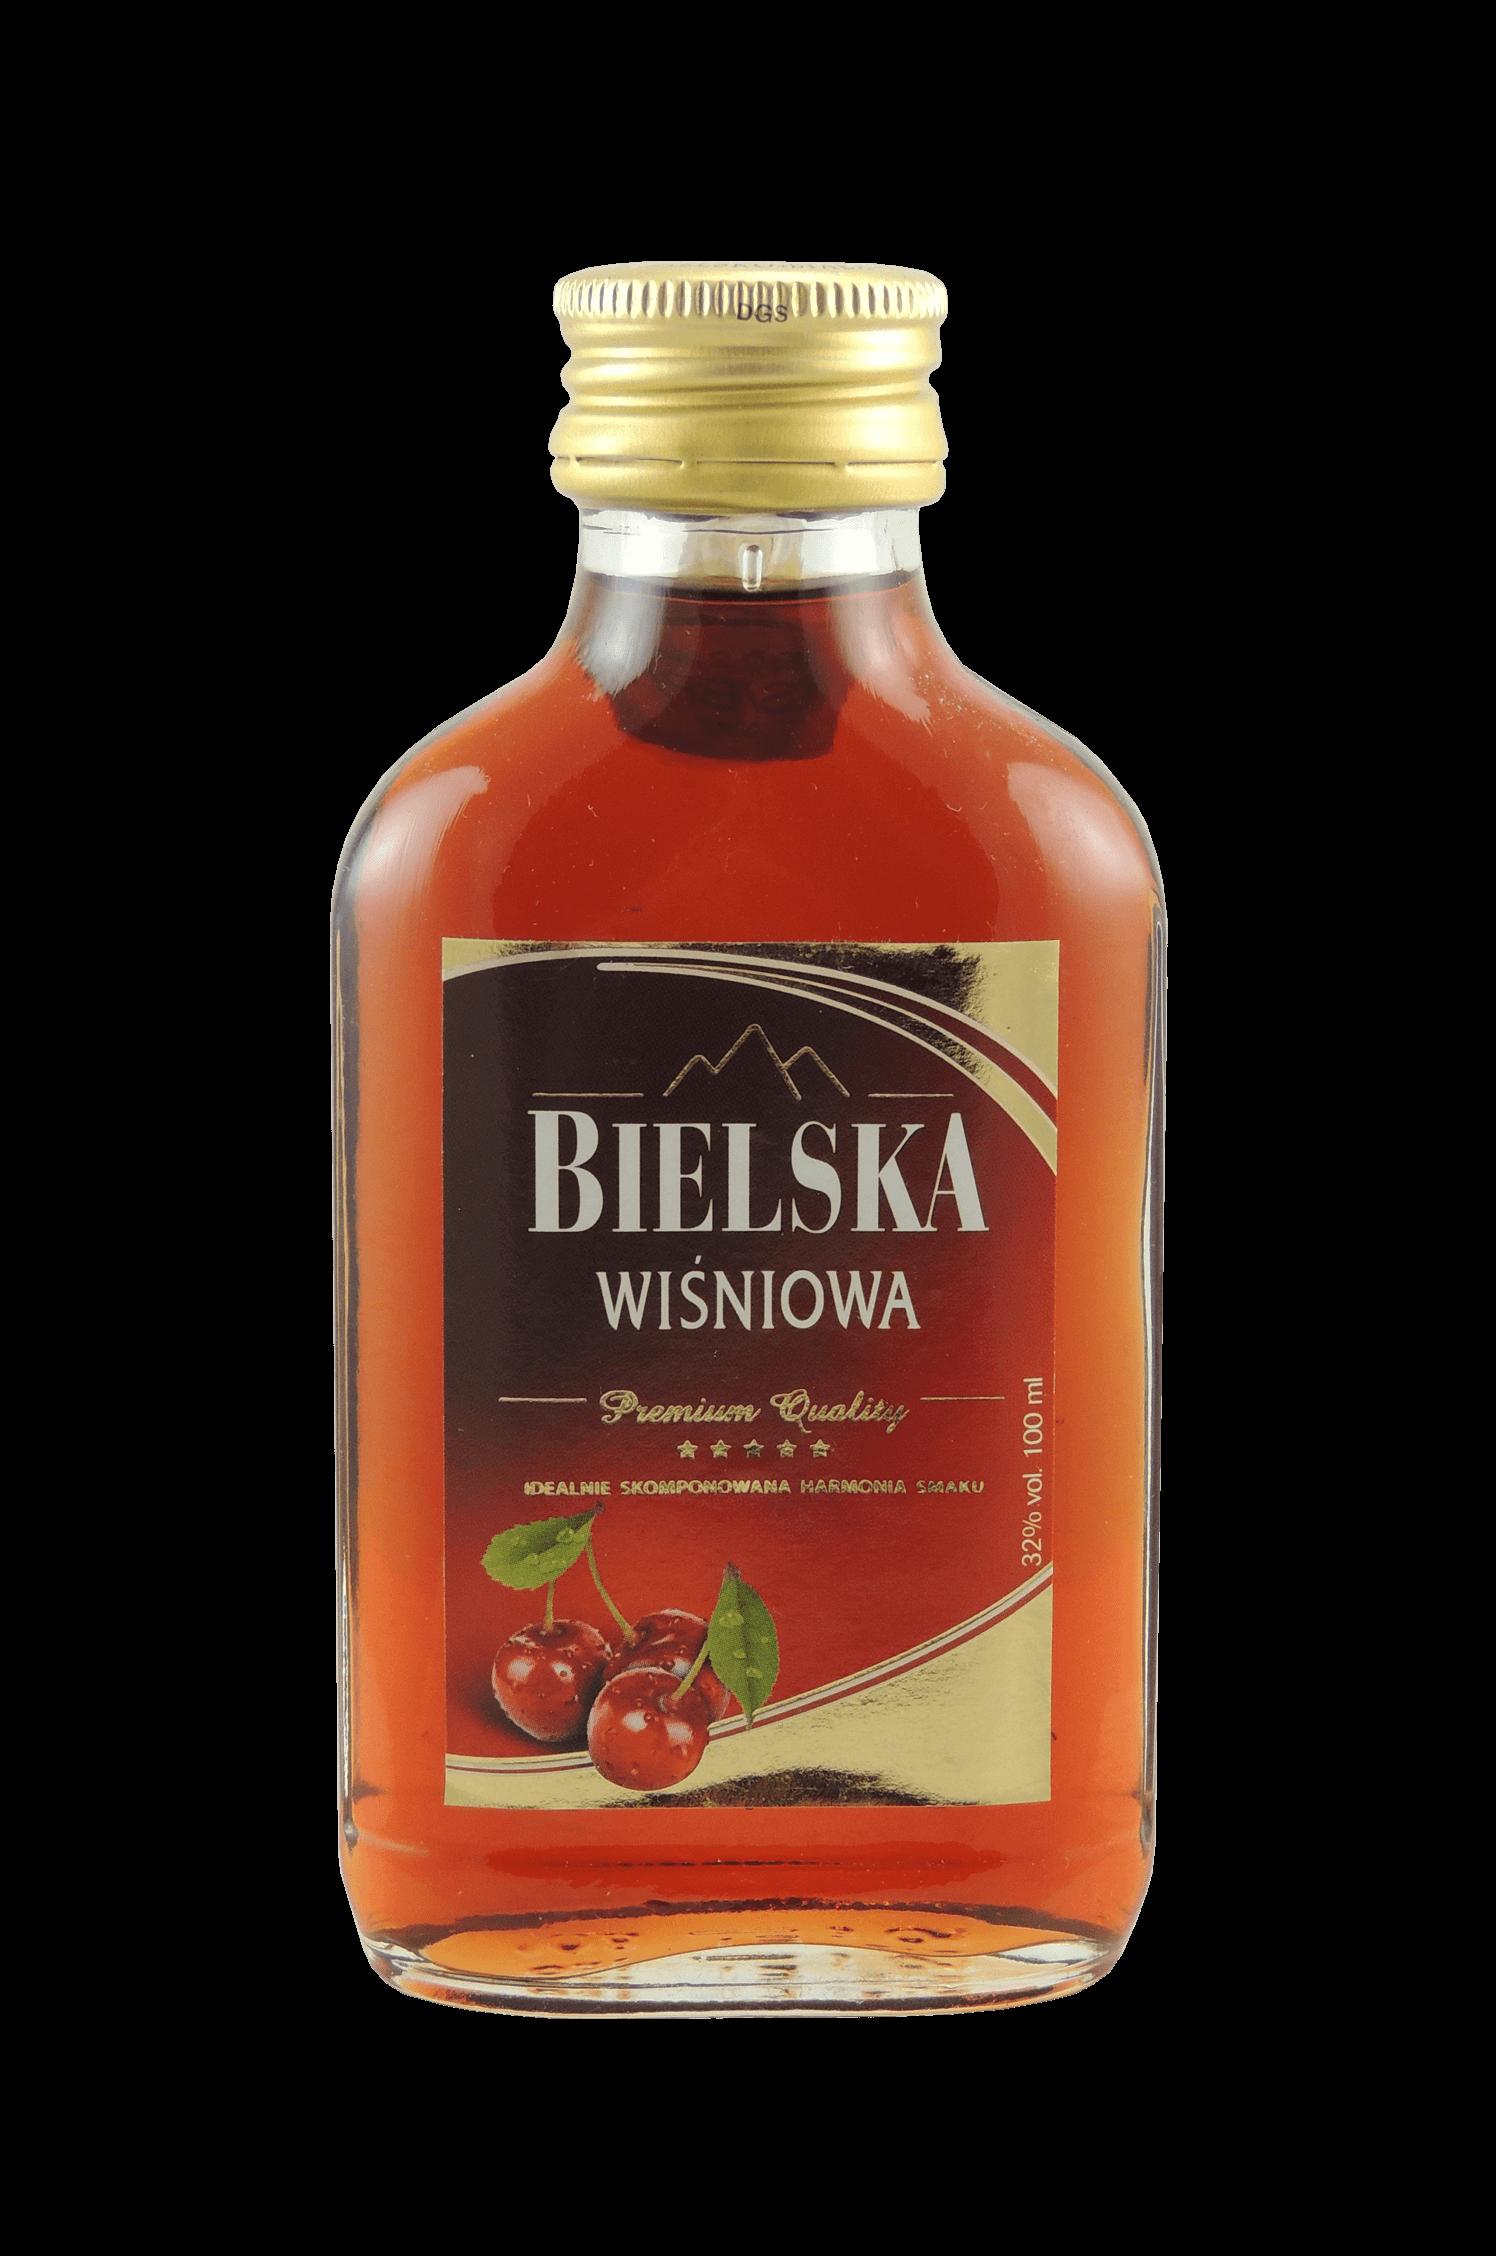 Bielska Wišniowa